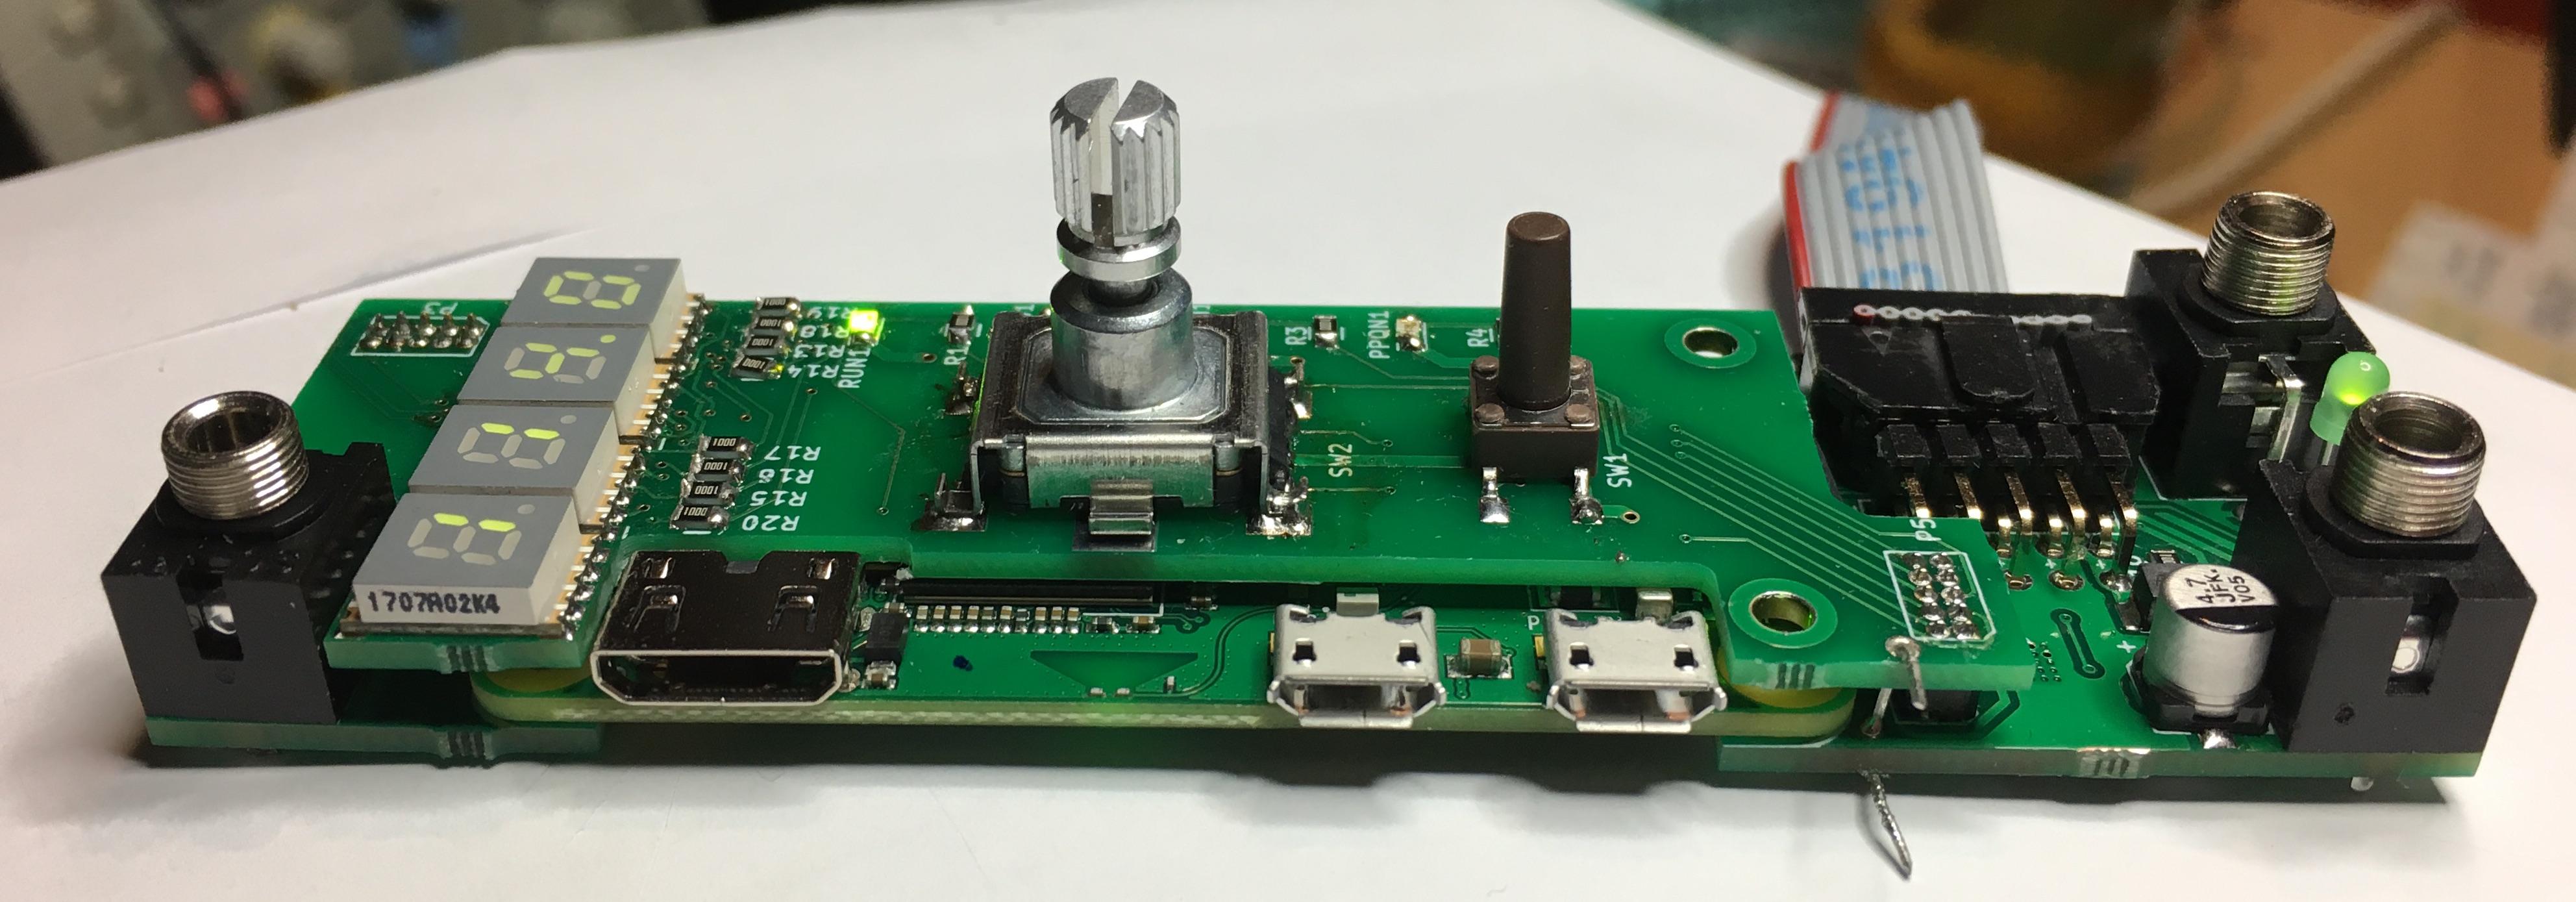 spink0 Raspberry Pi Zero W eurorack modular synth